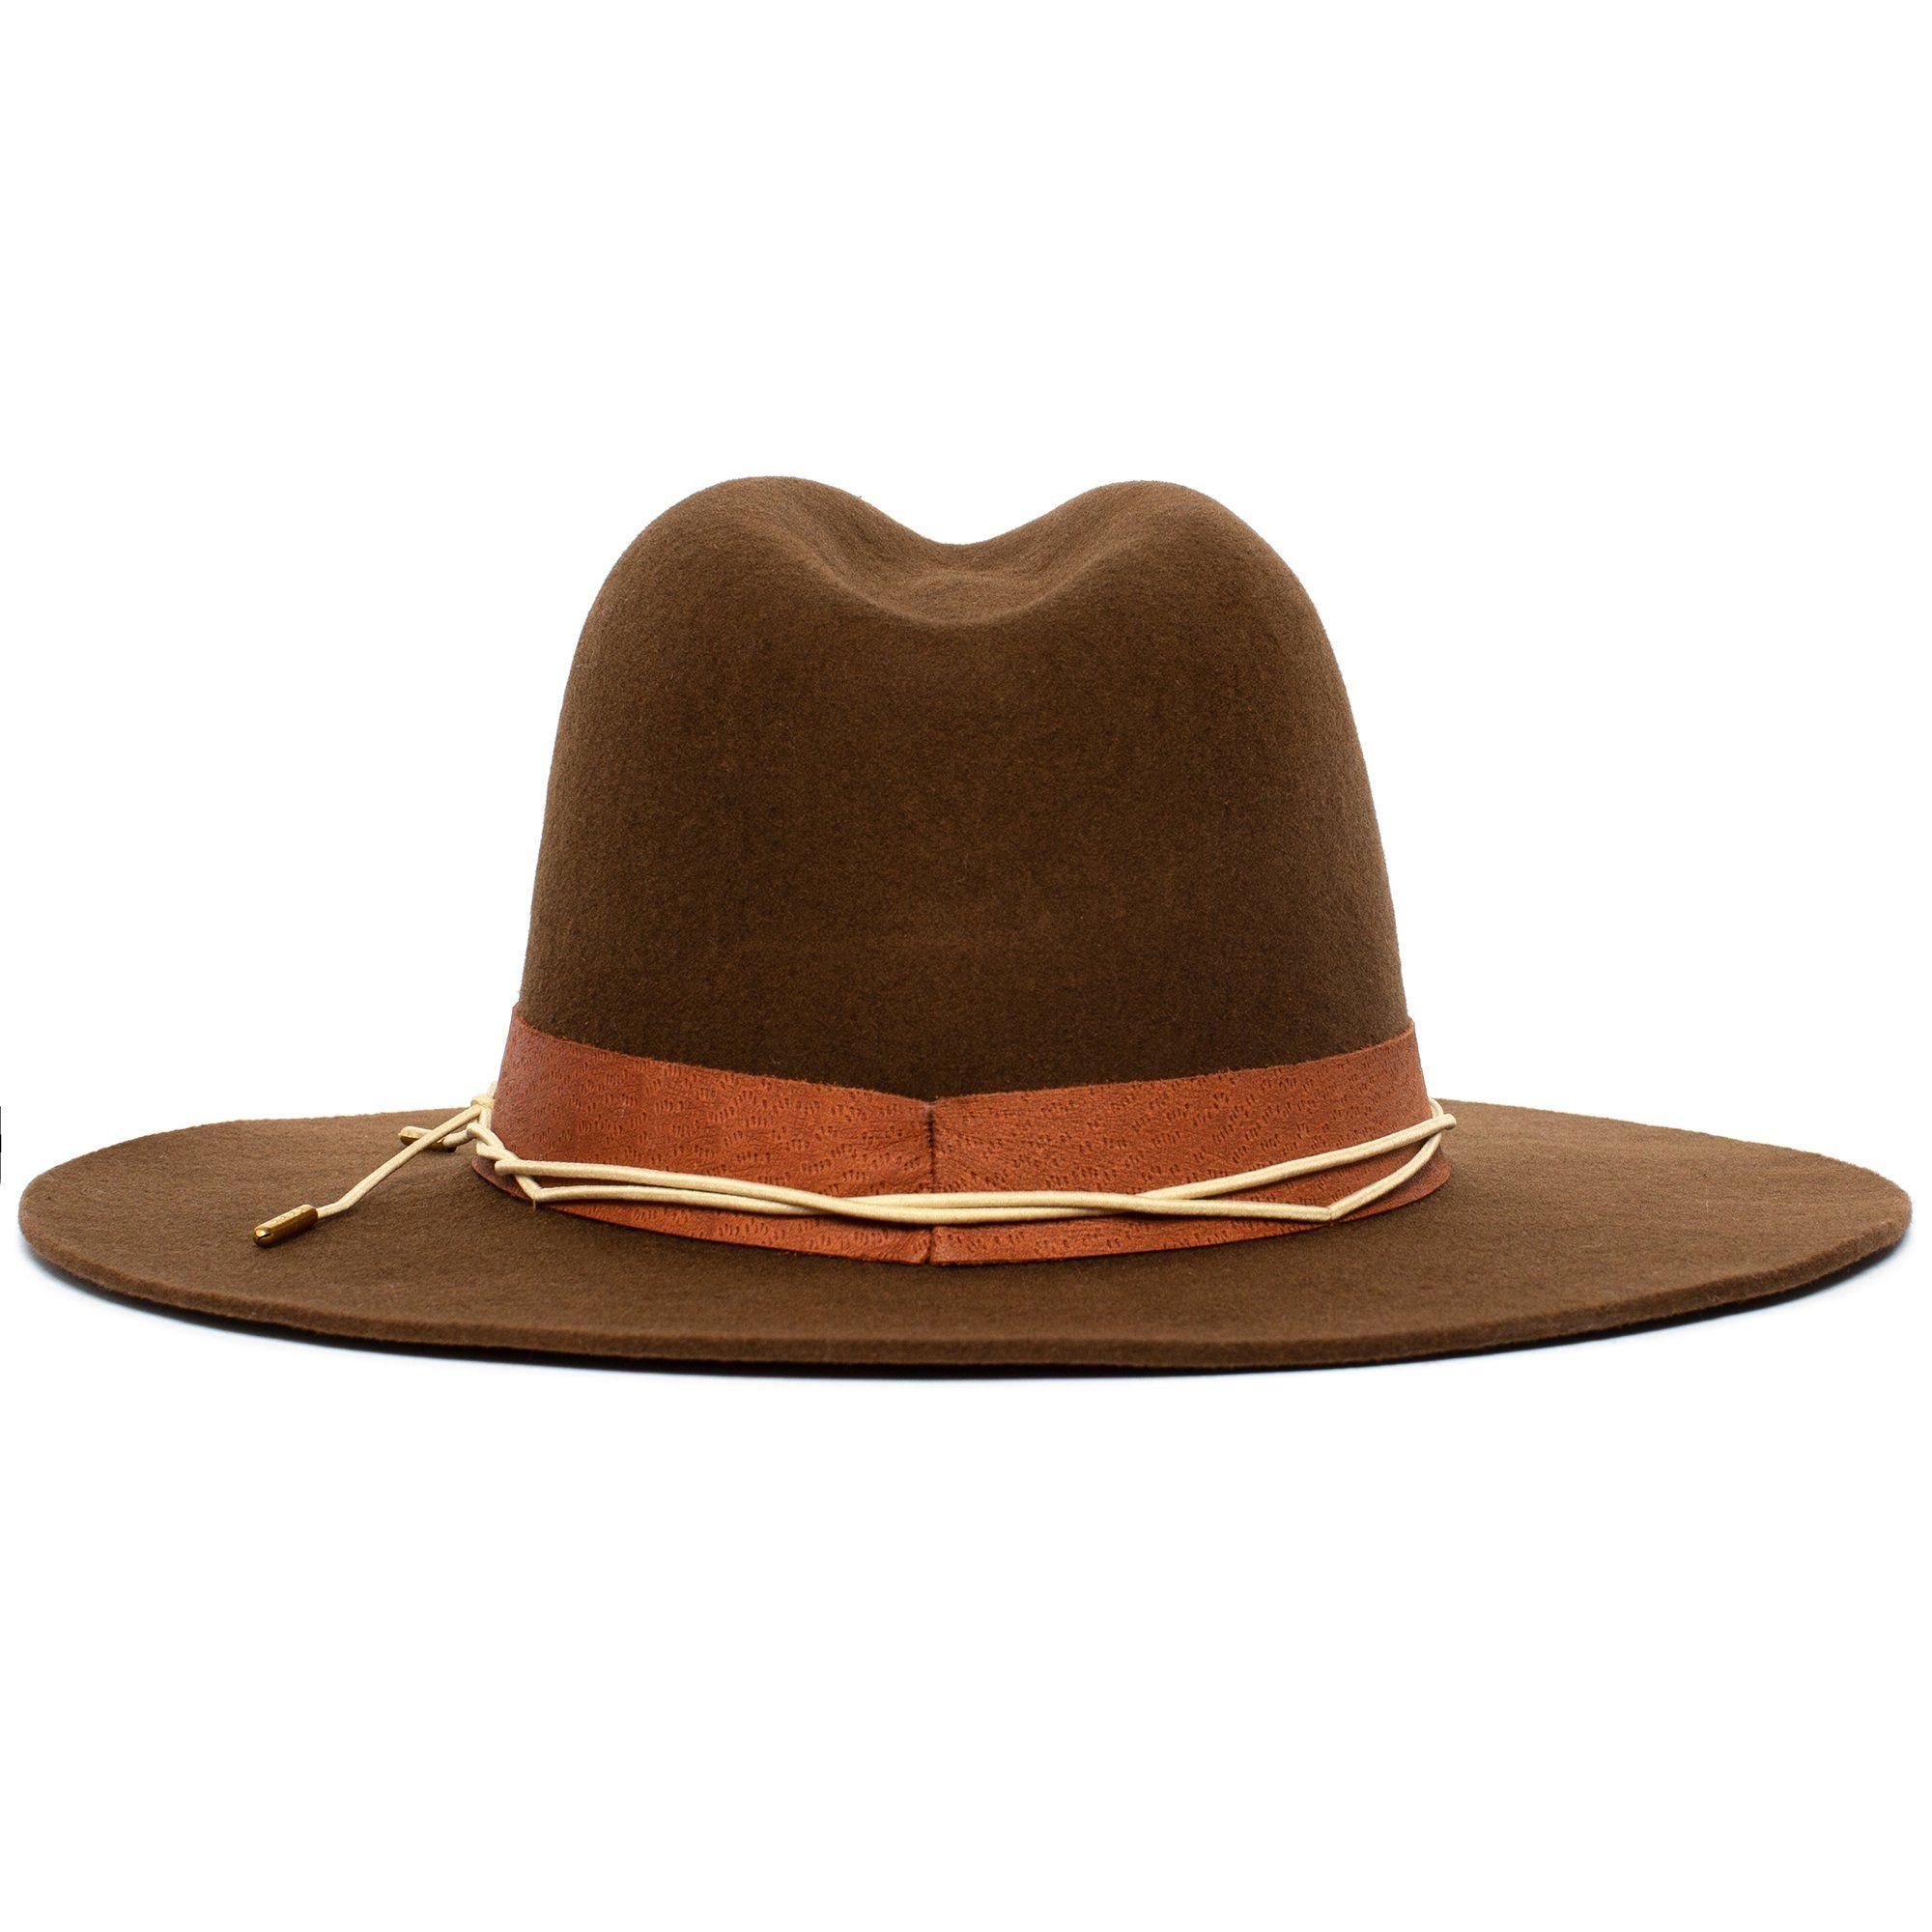 Goorin Tronador Fedora Hat in Whiskey, size Medium